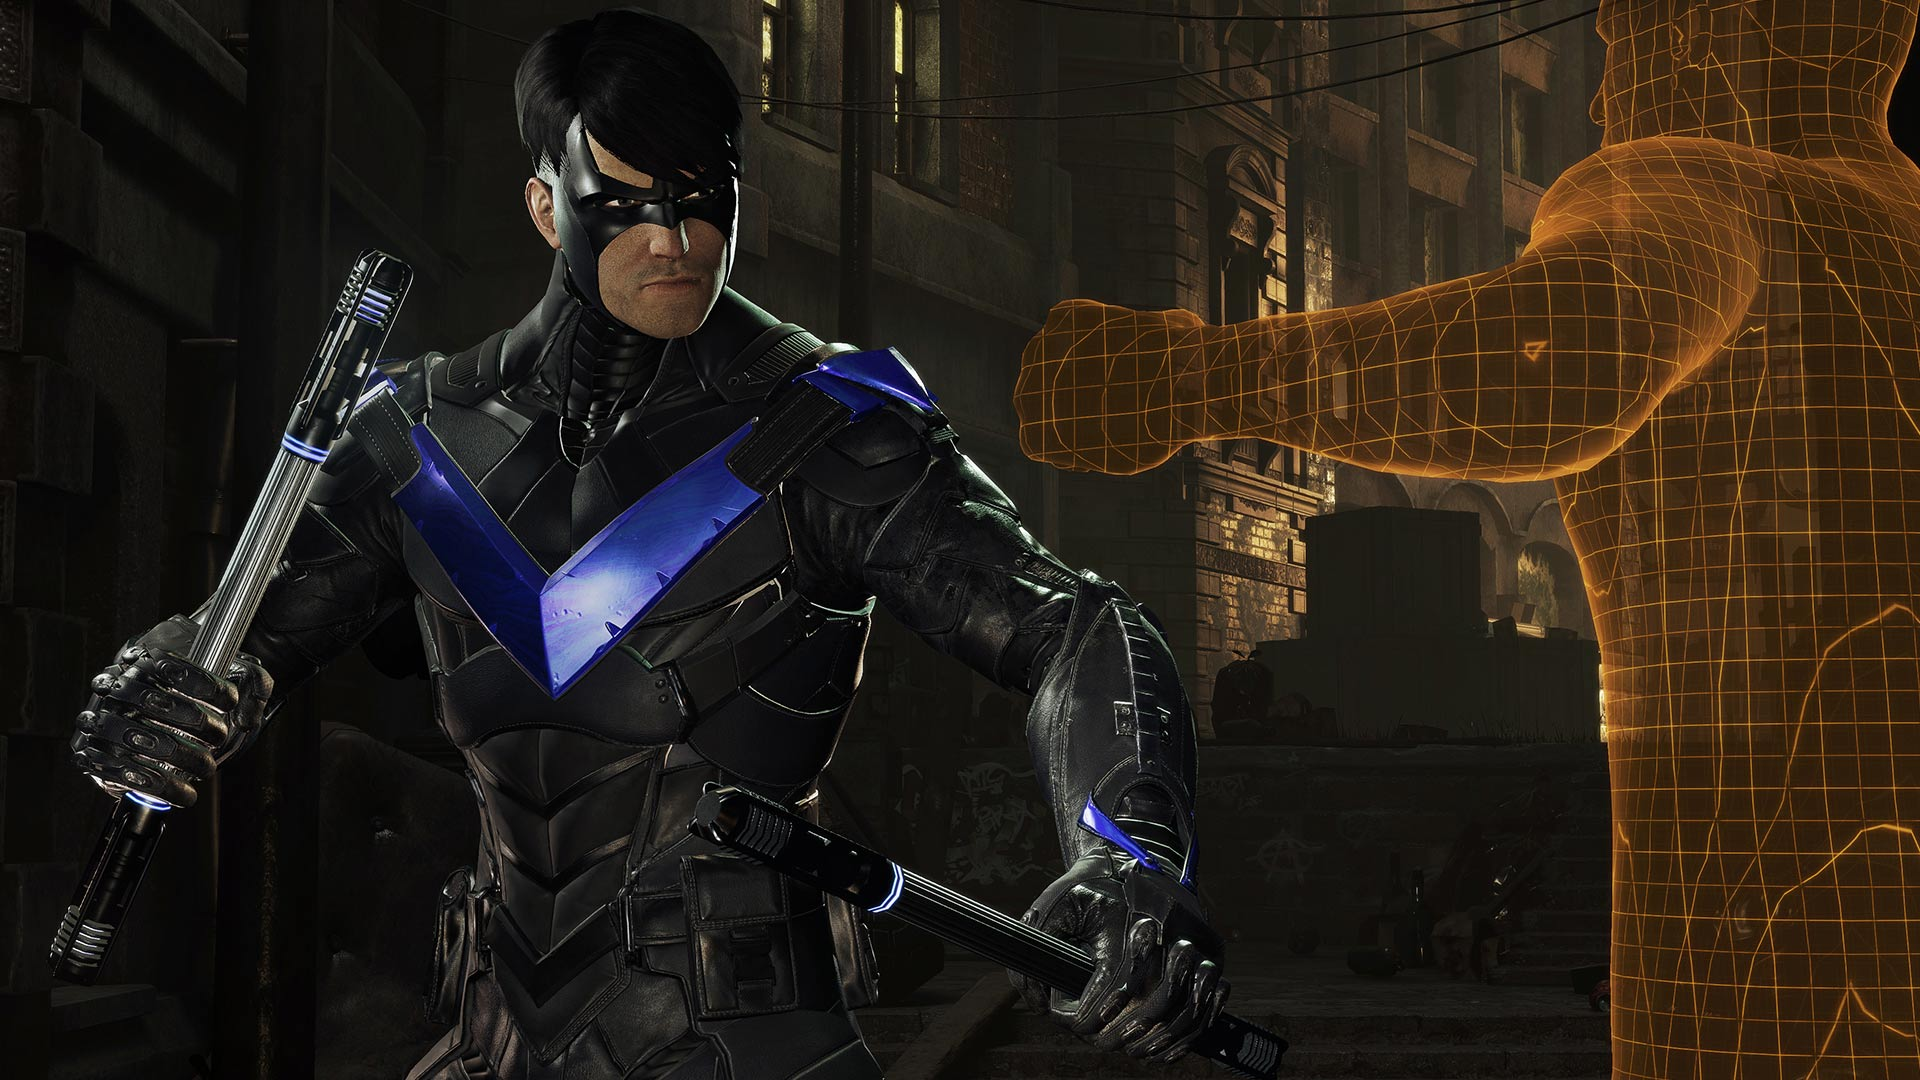 batman-arkham-vr-review-screenshot-3